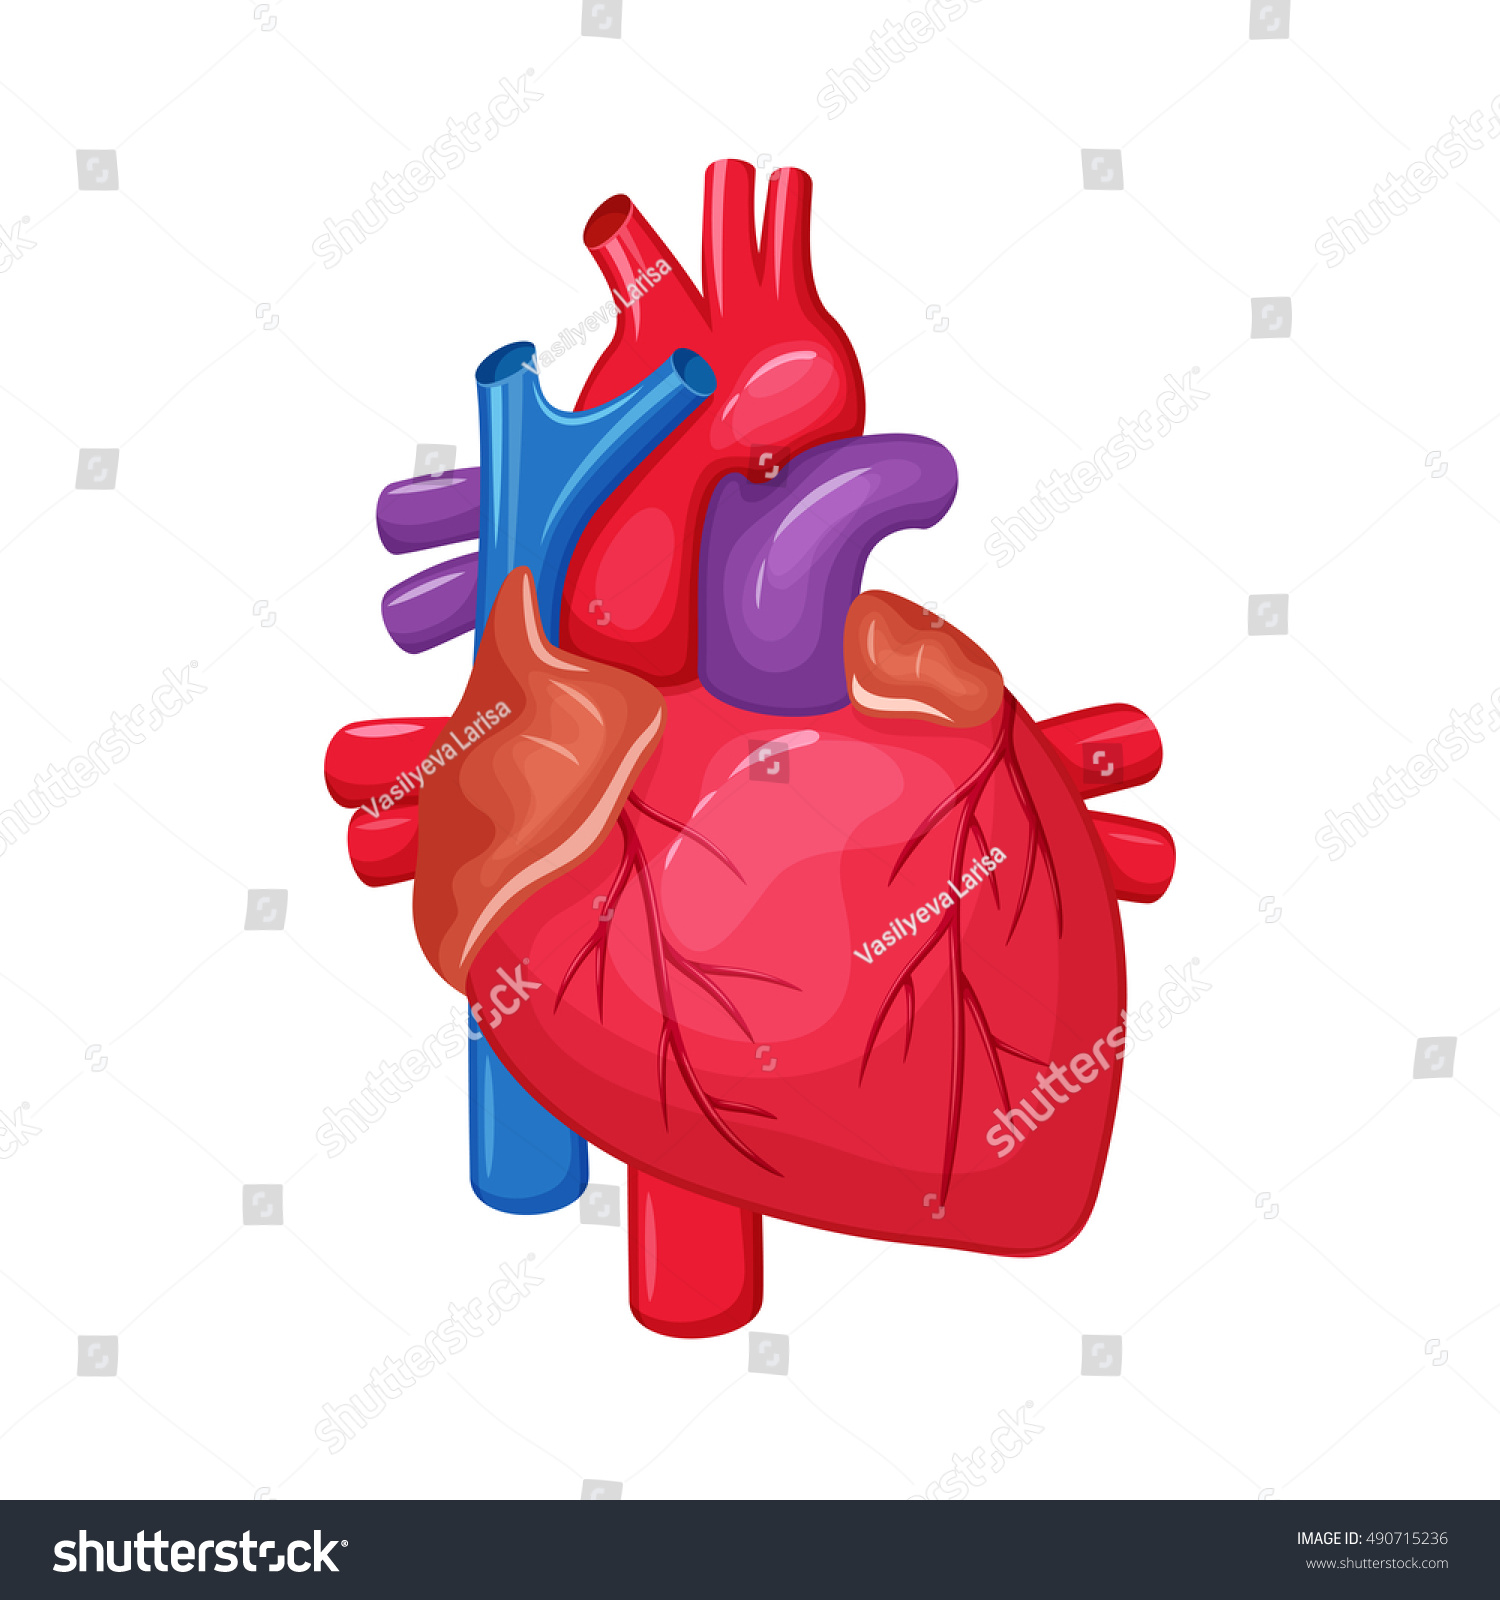 Human Heart Anatomy Medical Science Illustration Stock Illustration ...